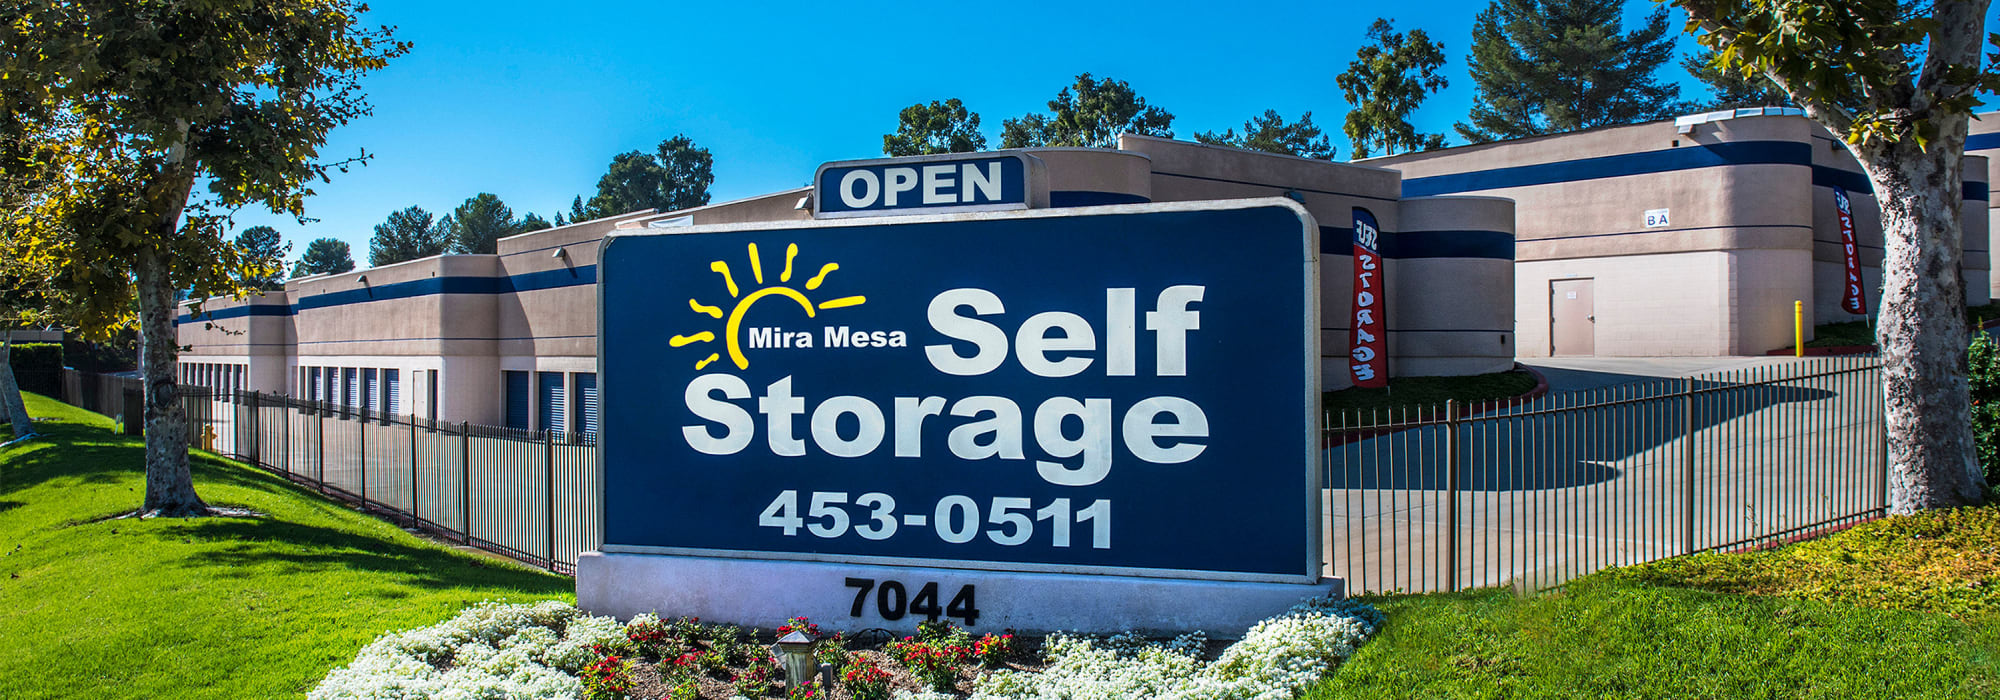 Branding on the exterior of Mira Mesa Self Storage in San Diego, California